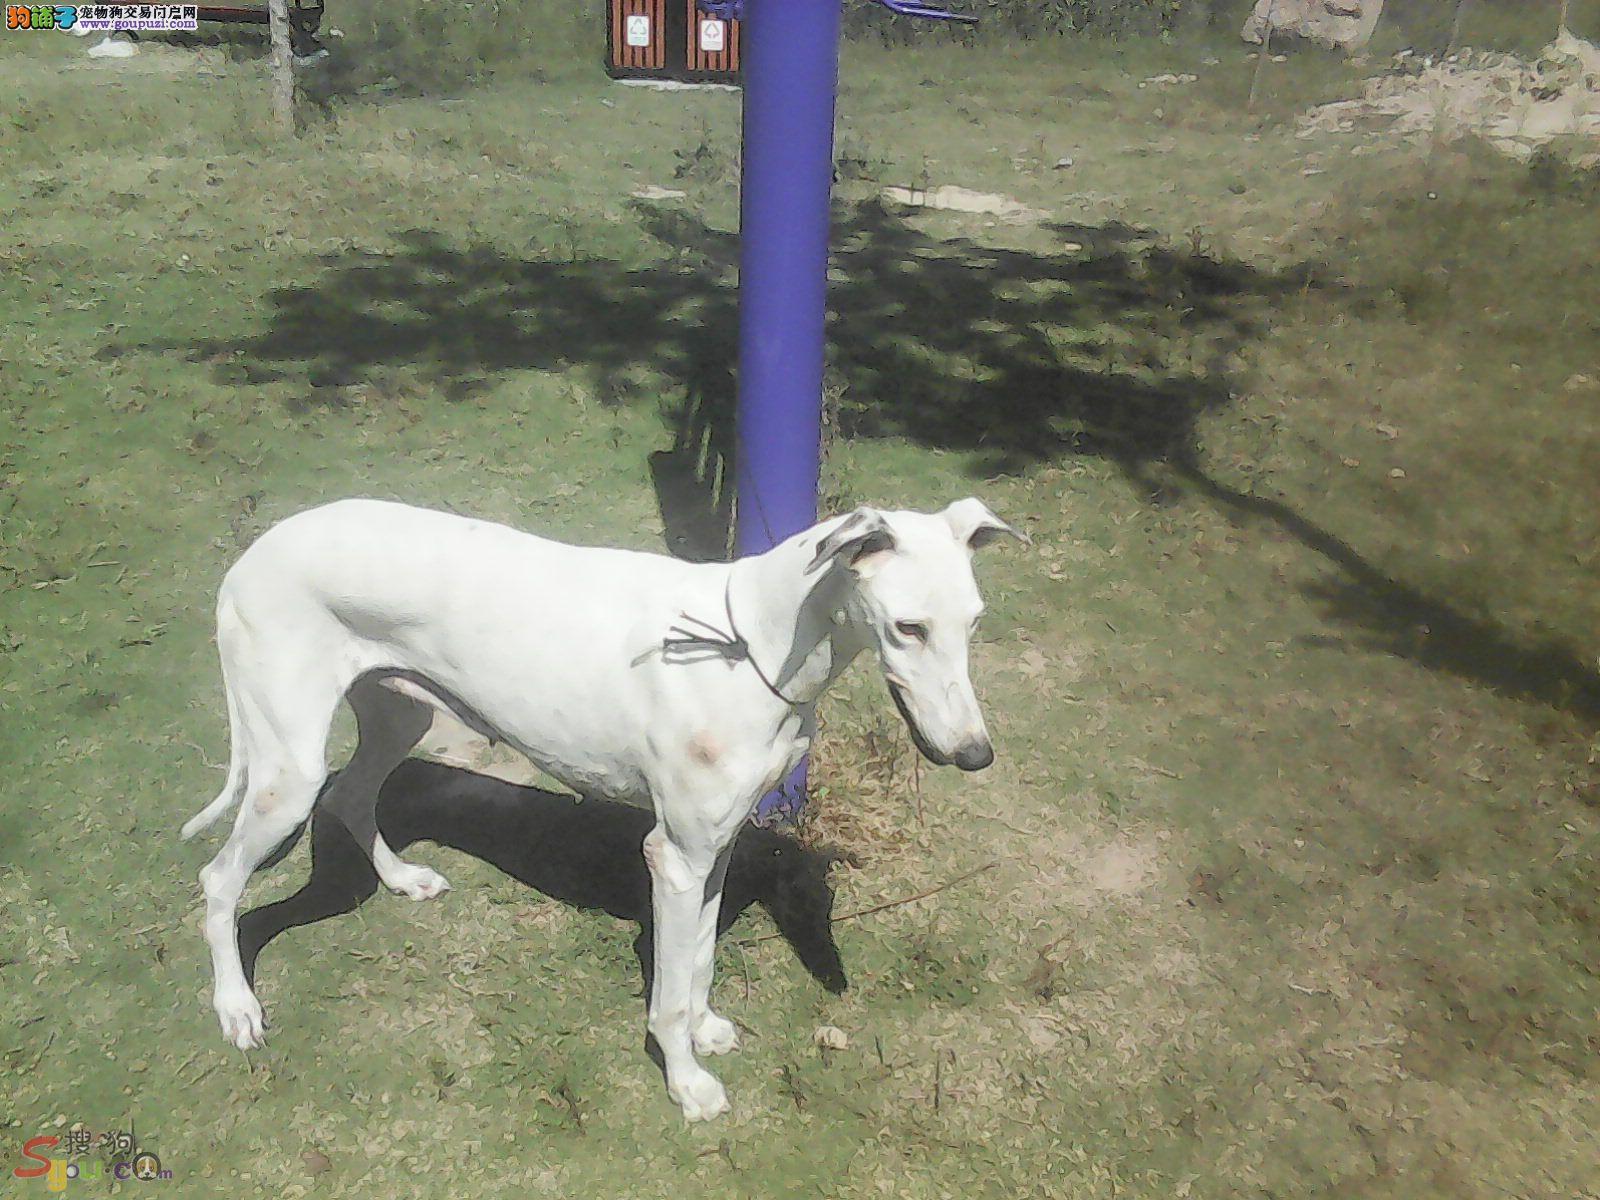 CKU认证犬舍出售高品质格力犬一分价钱一分货